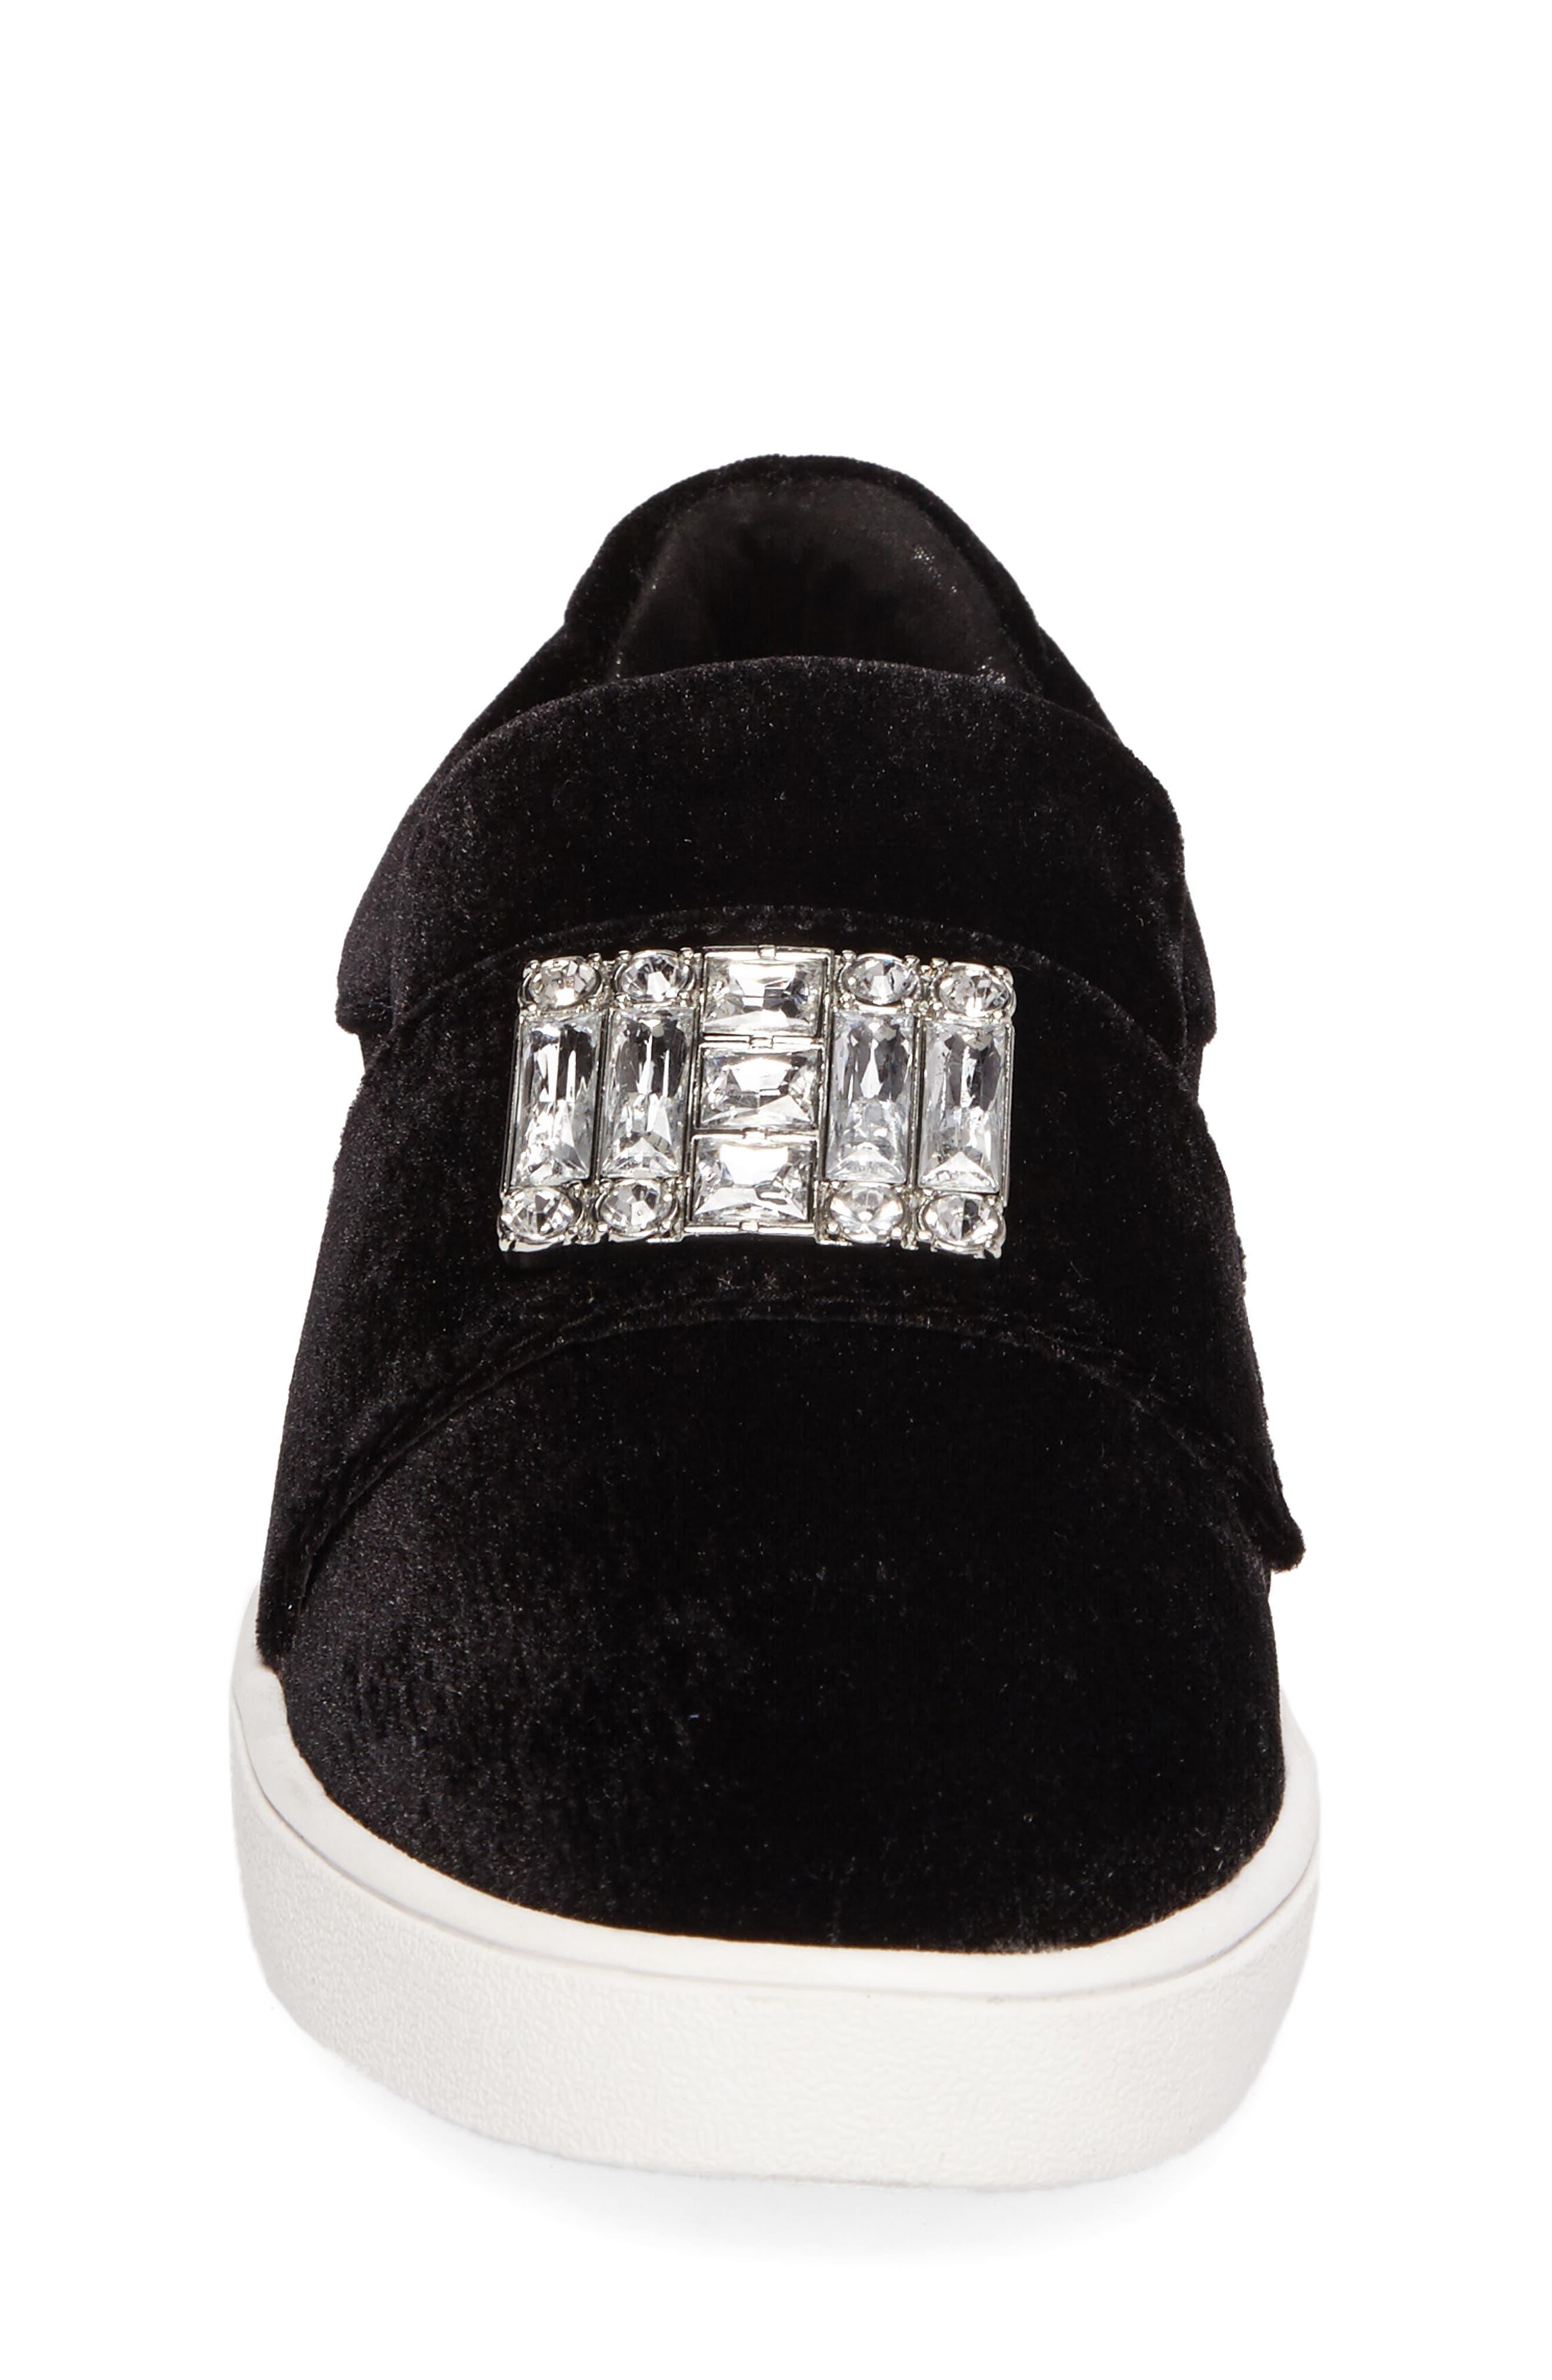 Ivy Dream Embellished Slip-On Sneaker,                             Alternate thumbnail 4, color,                             Black